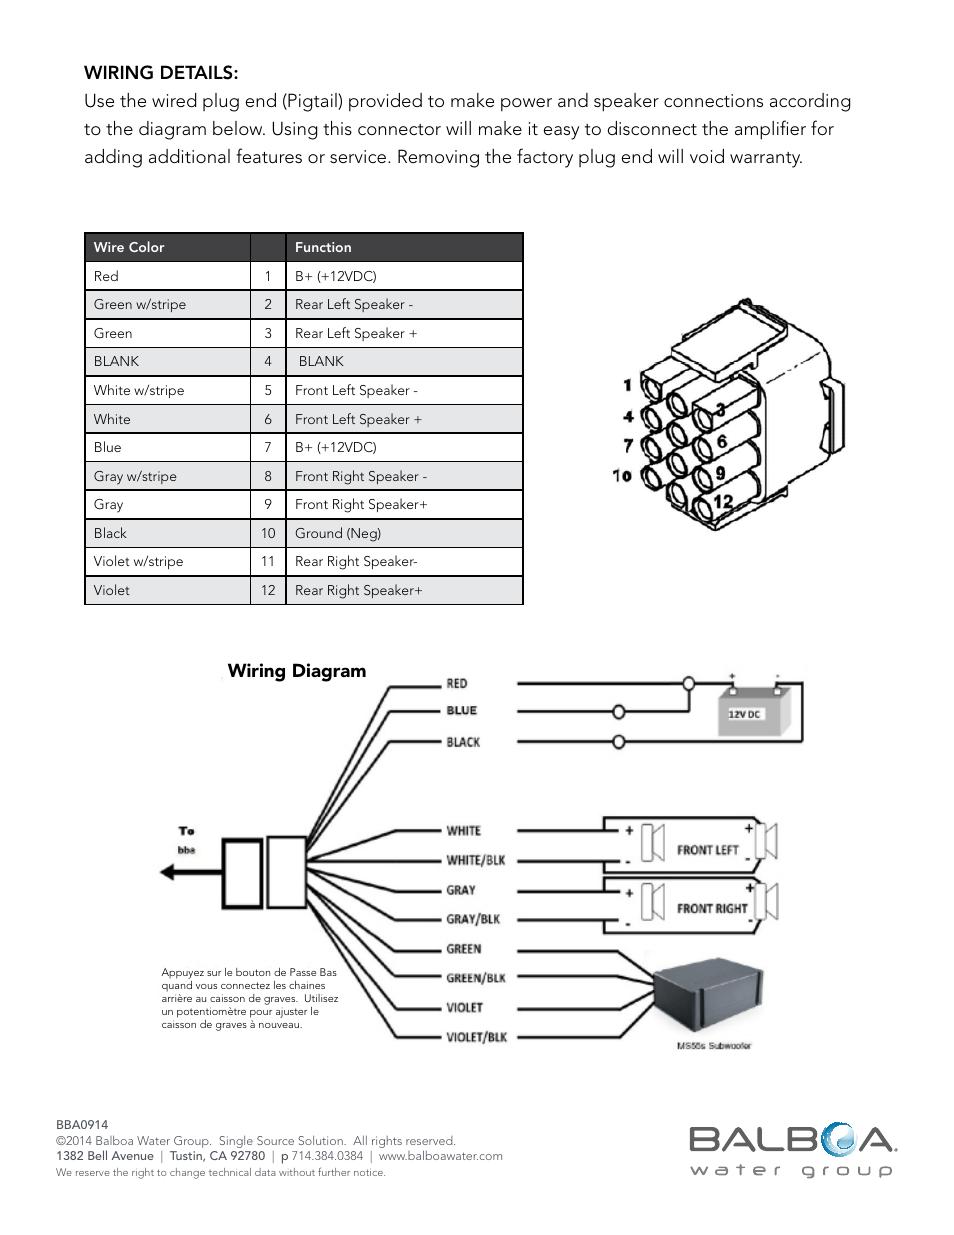 Morgan Spa Heater Wire Diagram : 30 Wiring Diagram Images